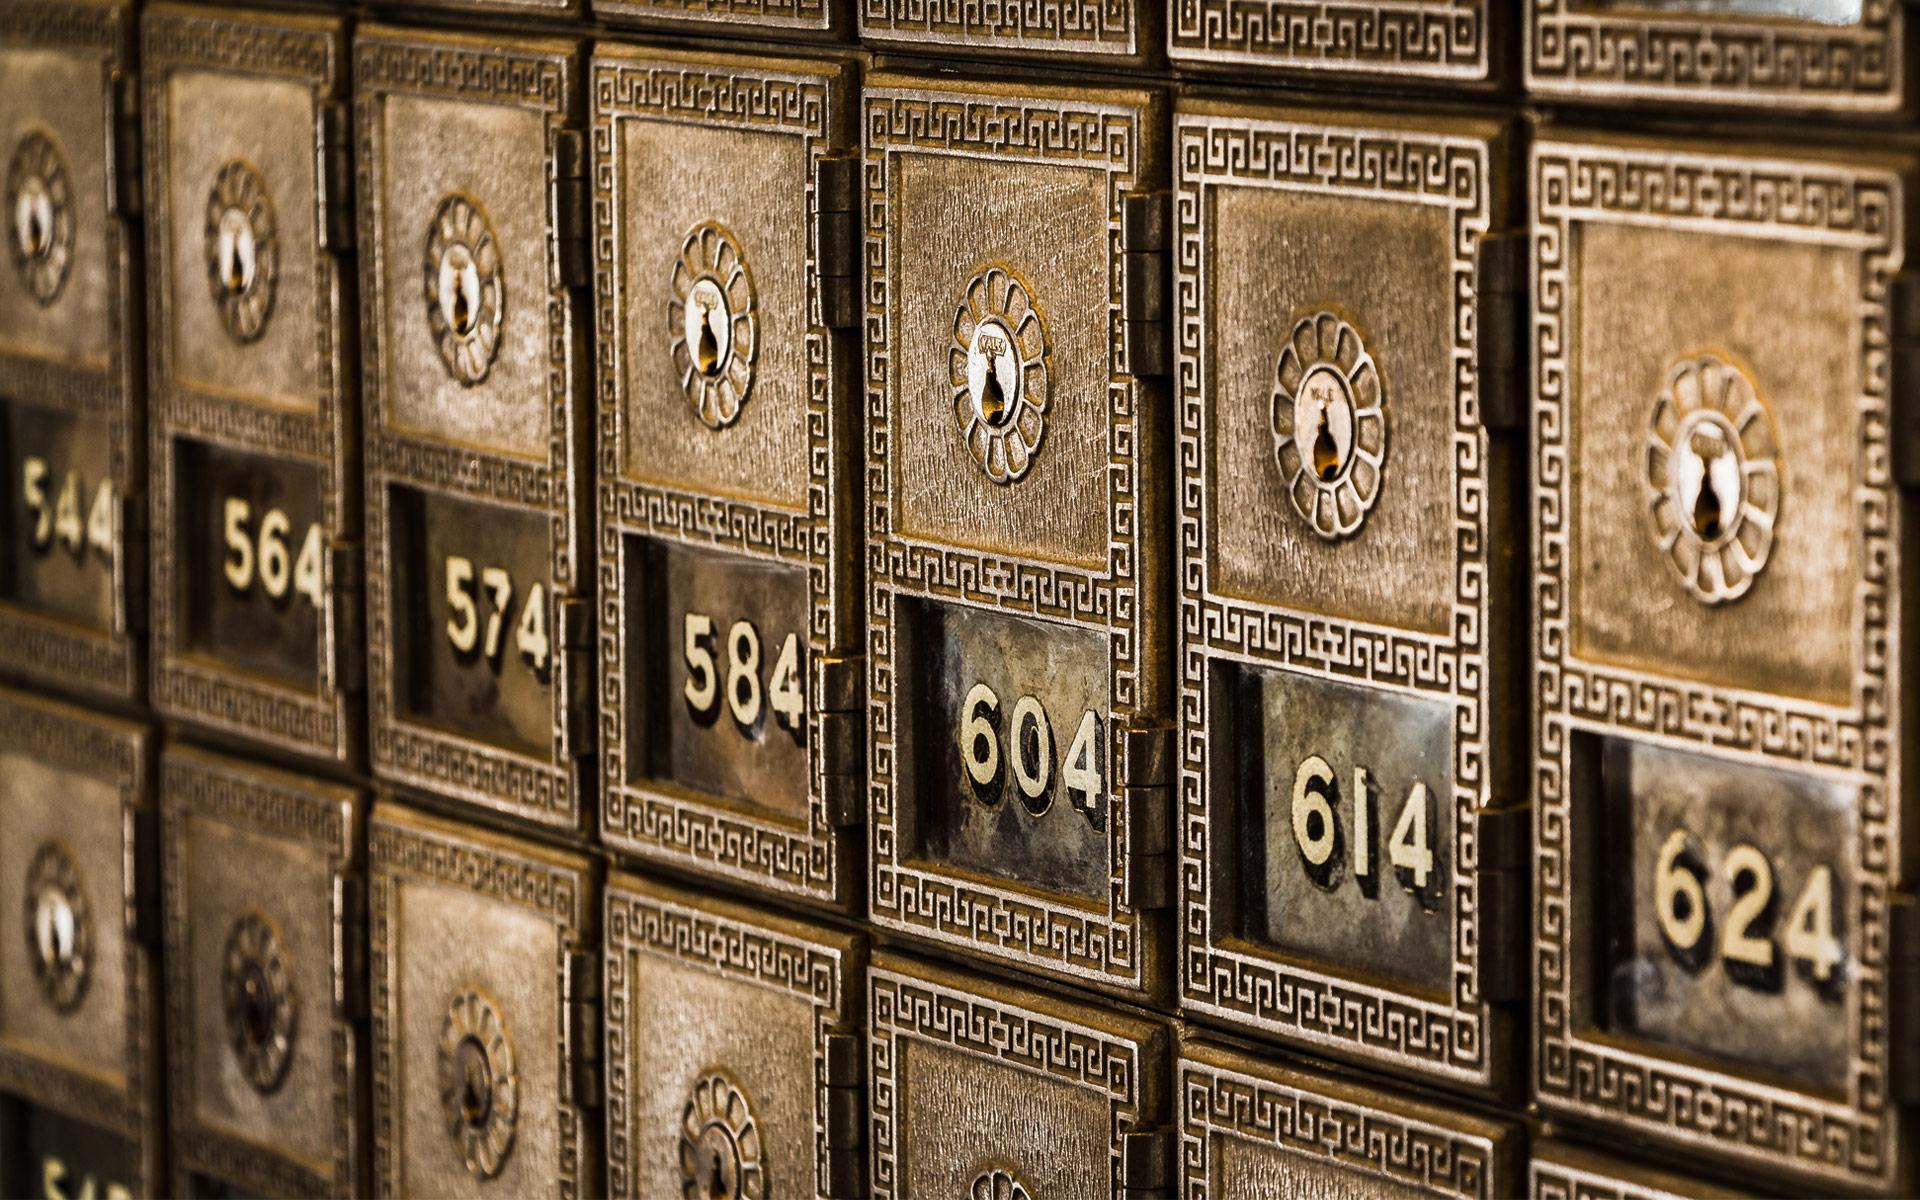 Standout Image - Safe deposit boxes